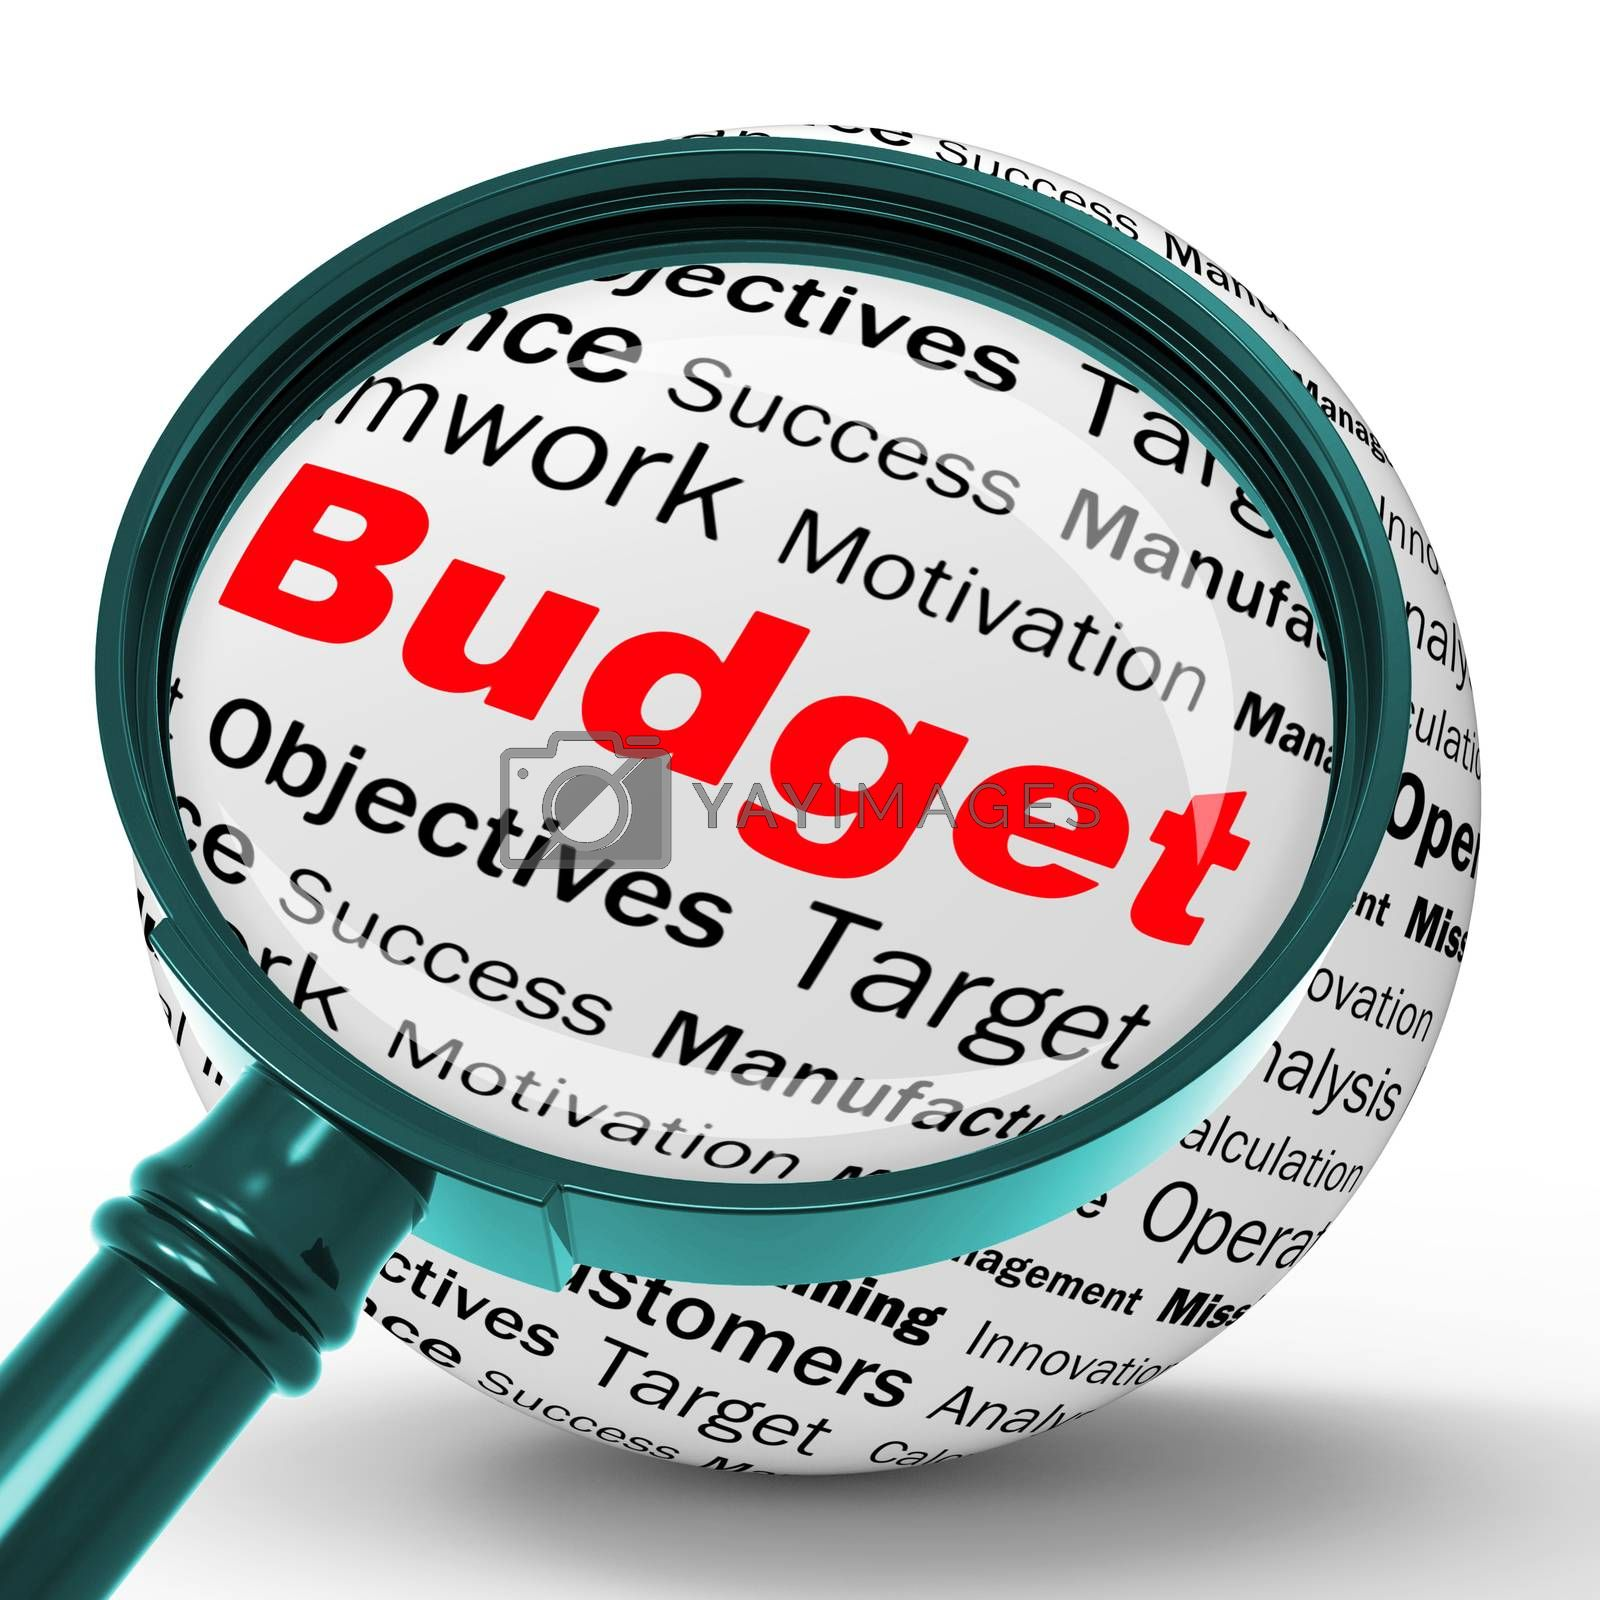 Budget Magnifier Definition Shows Financial Management Or busine by stuartmiles